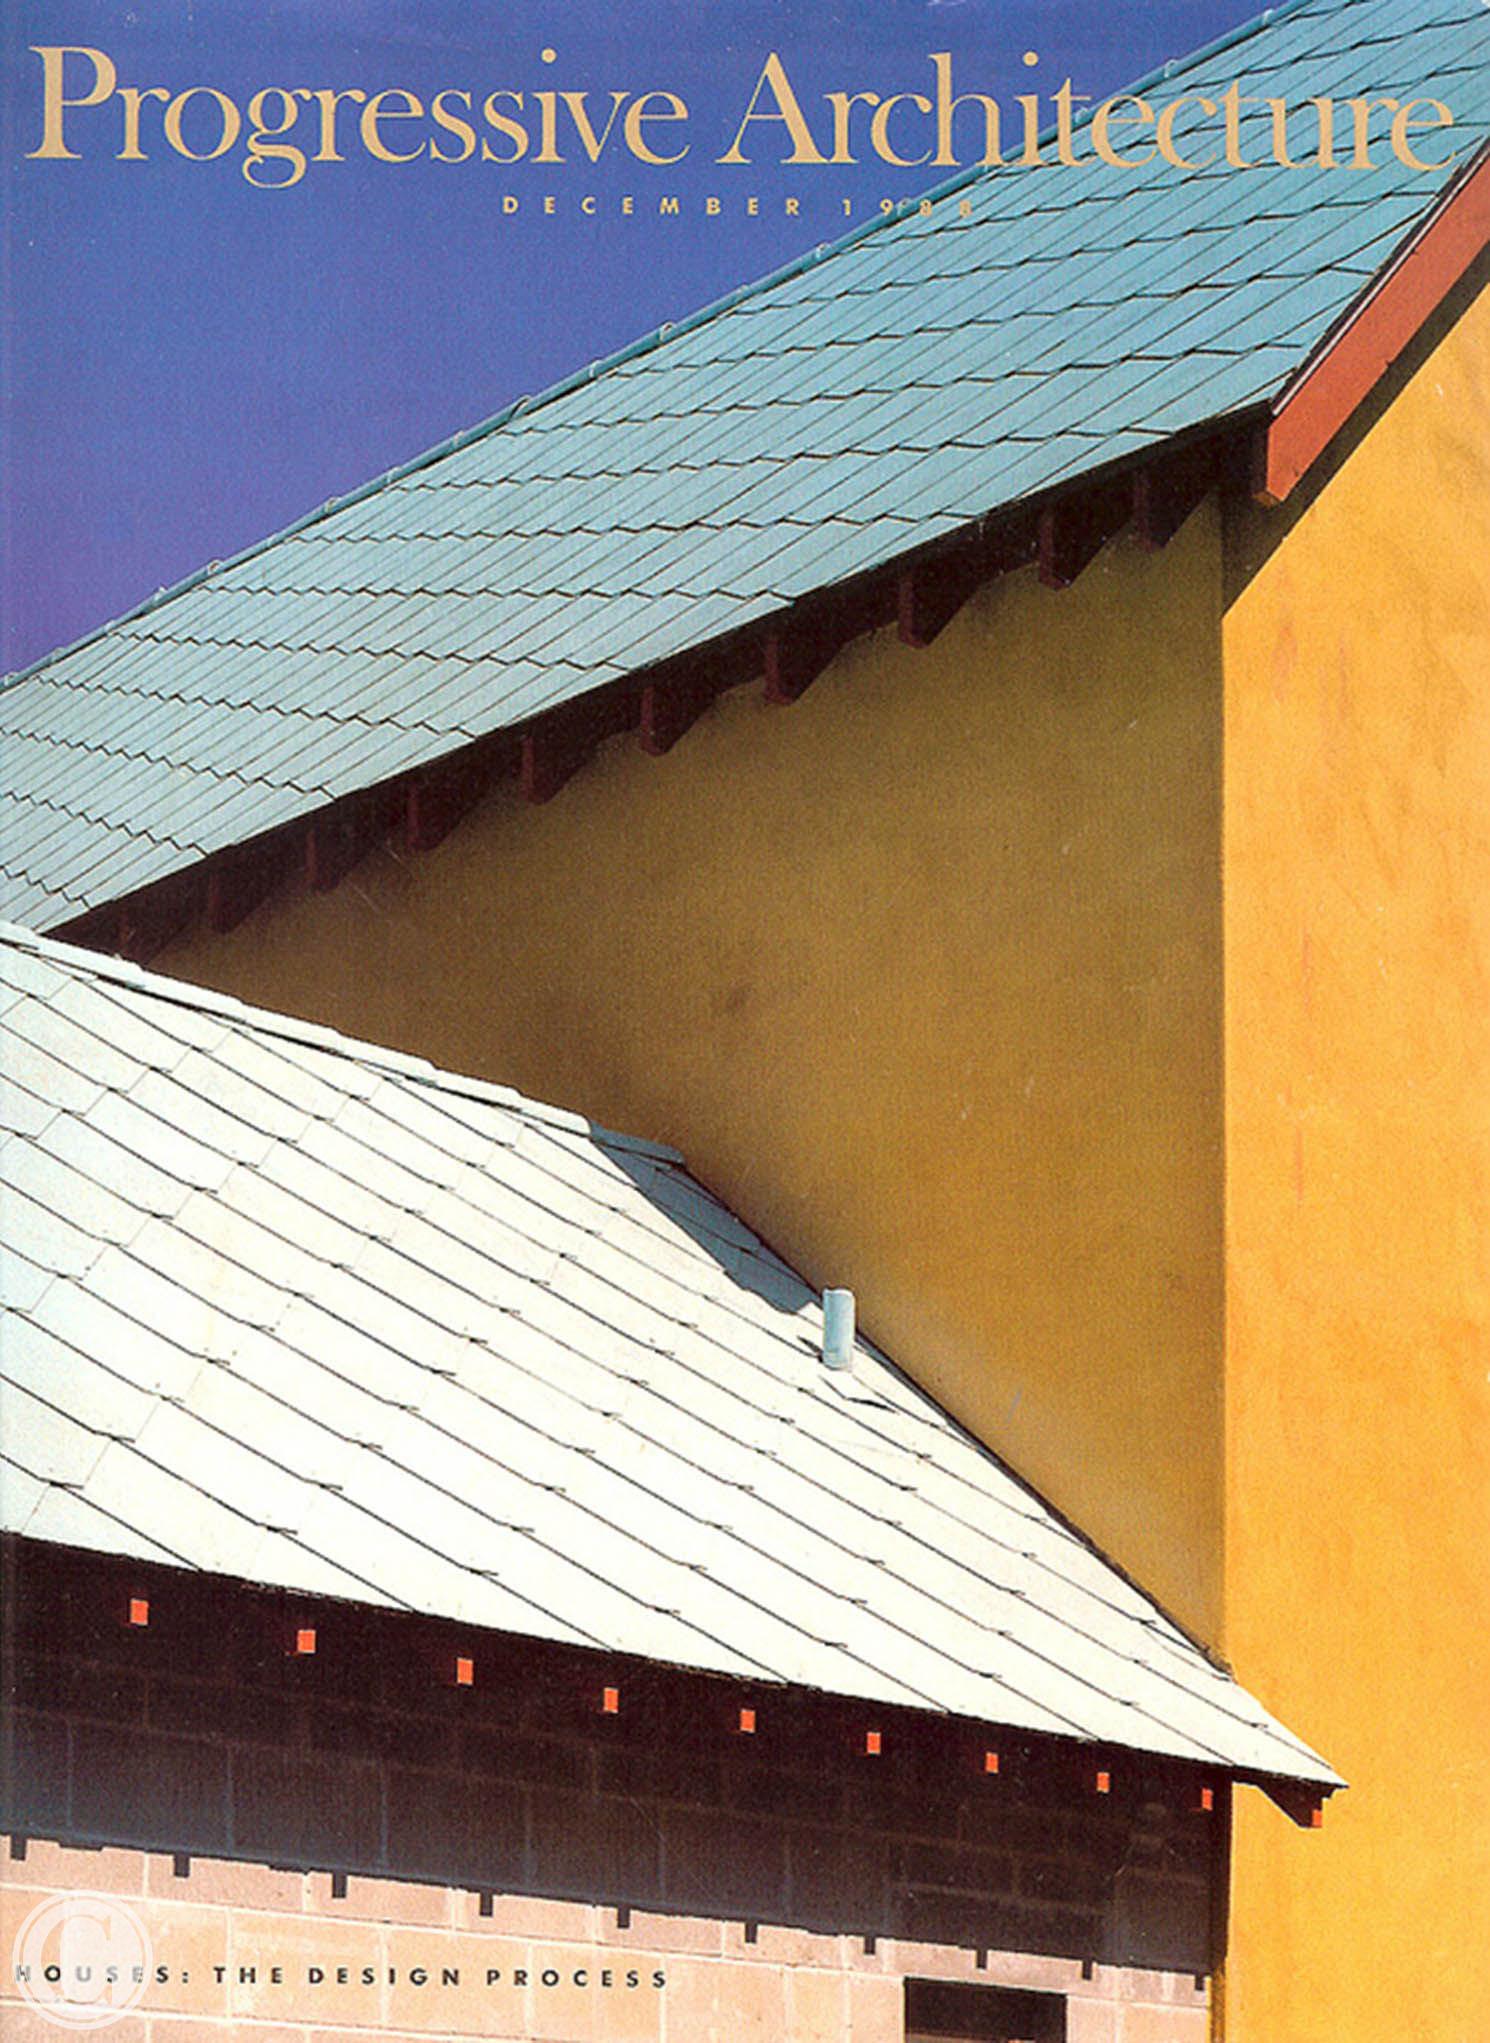 Progressive Architecture Steven Harris Cornelius Construction builder